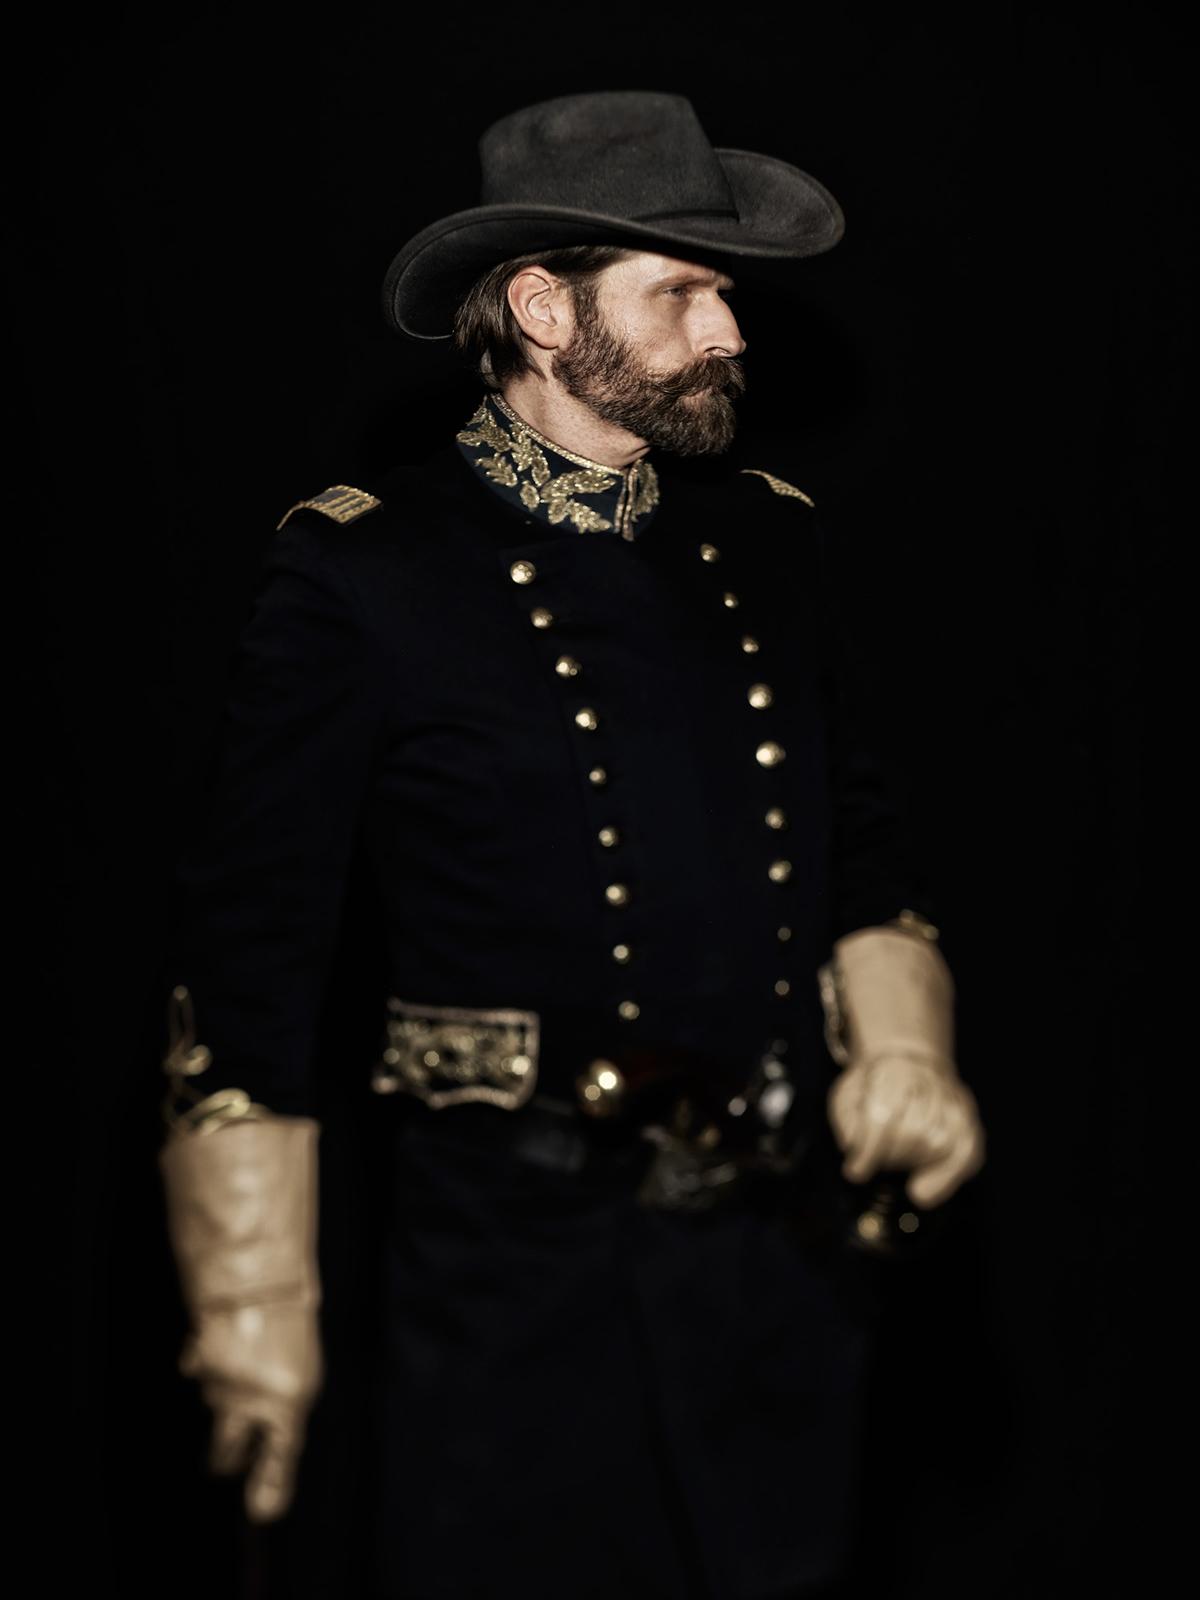 TV_History_TexasRising_KevinLynch-Portrait03.jpg